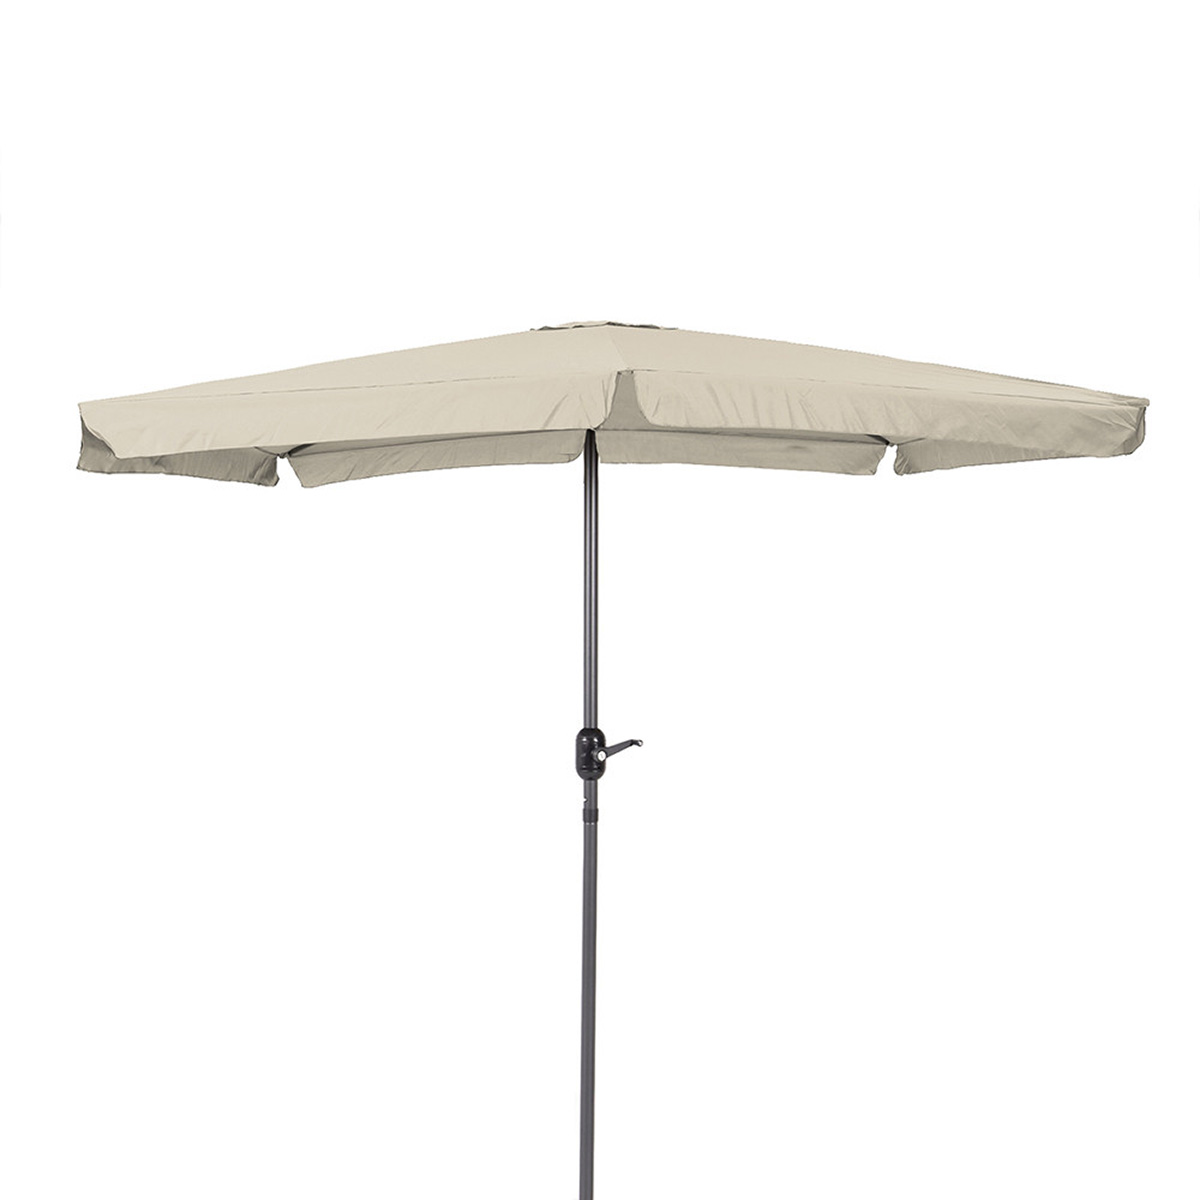 Parasol carré en aluminium - Naturel - 250.00 cm x 250.00 cm